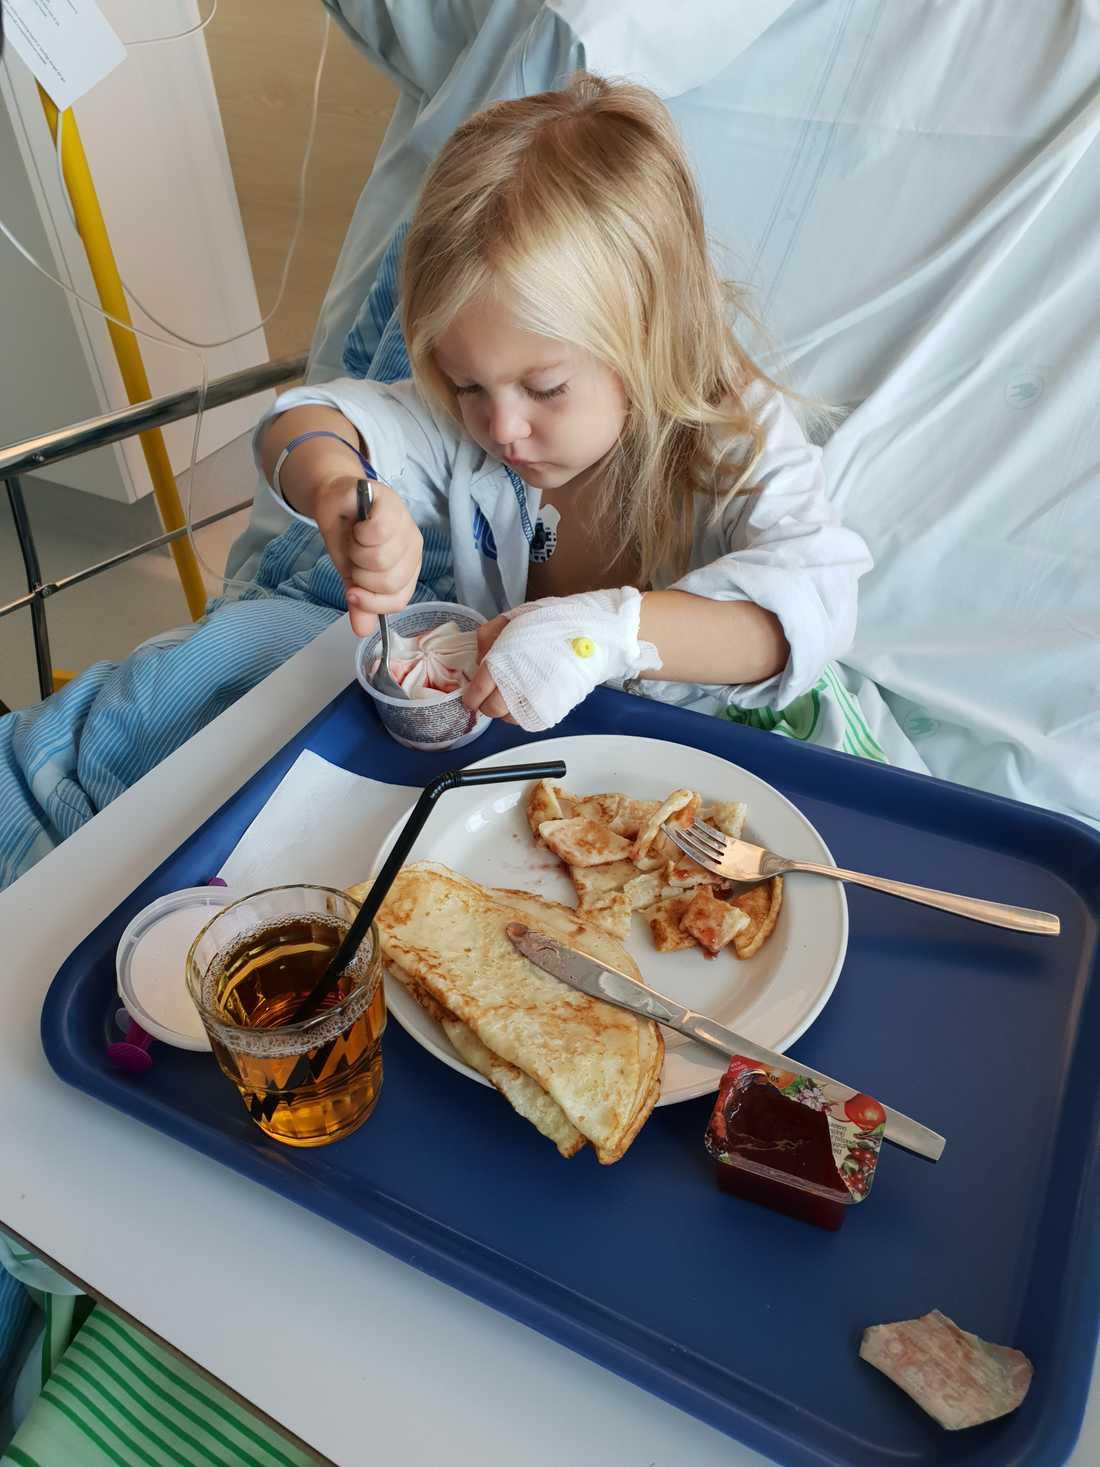 Ellie äter pannkakor i sjukhussängen.